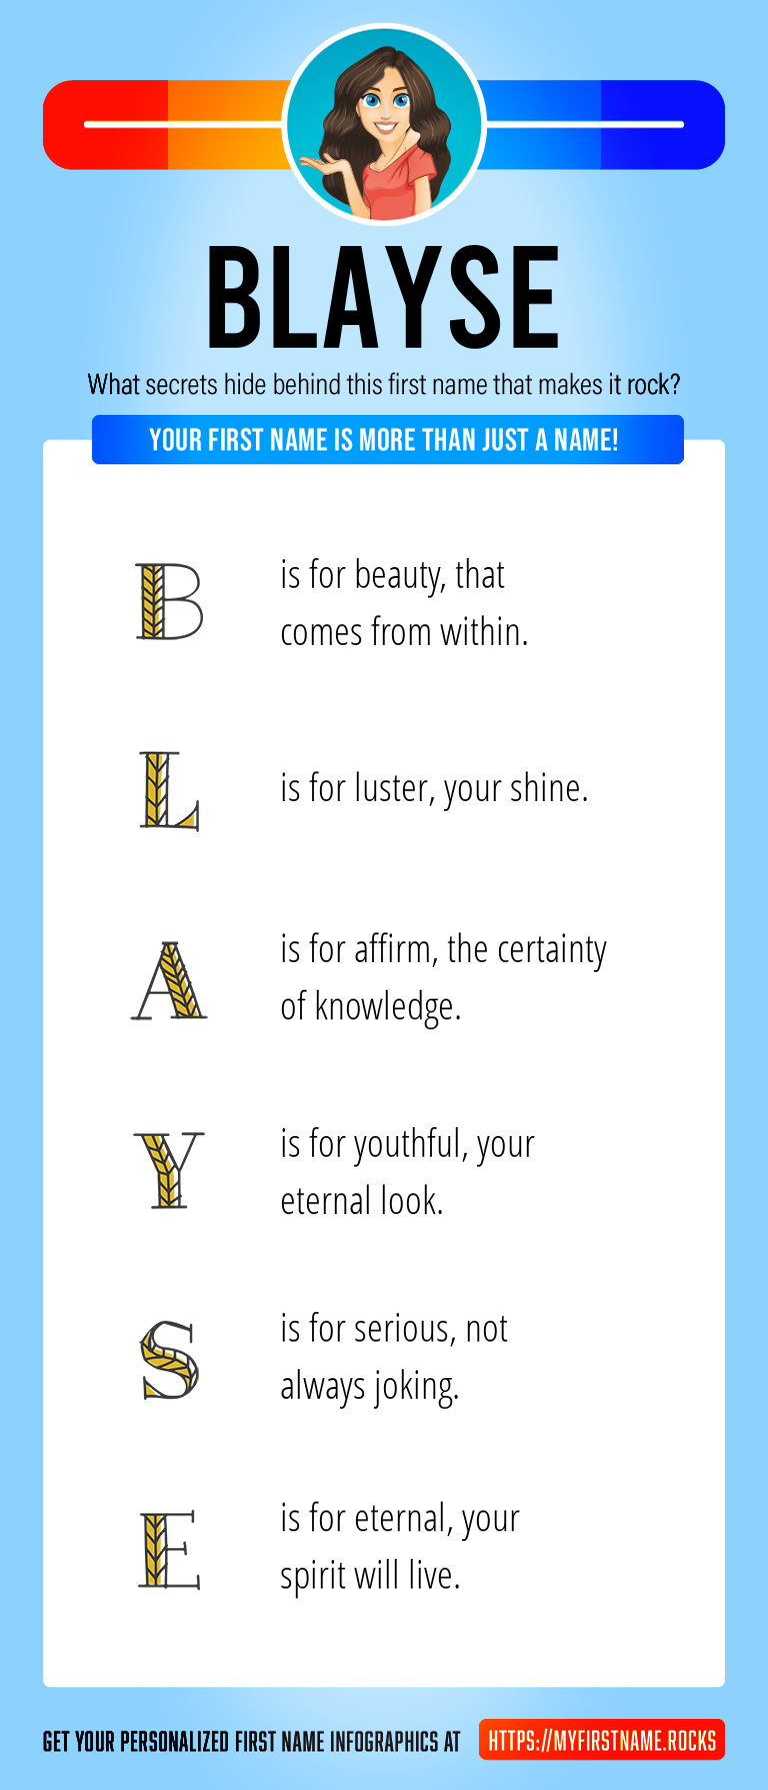 Blayse Infographics